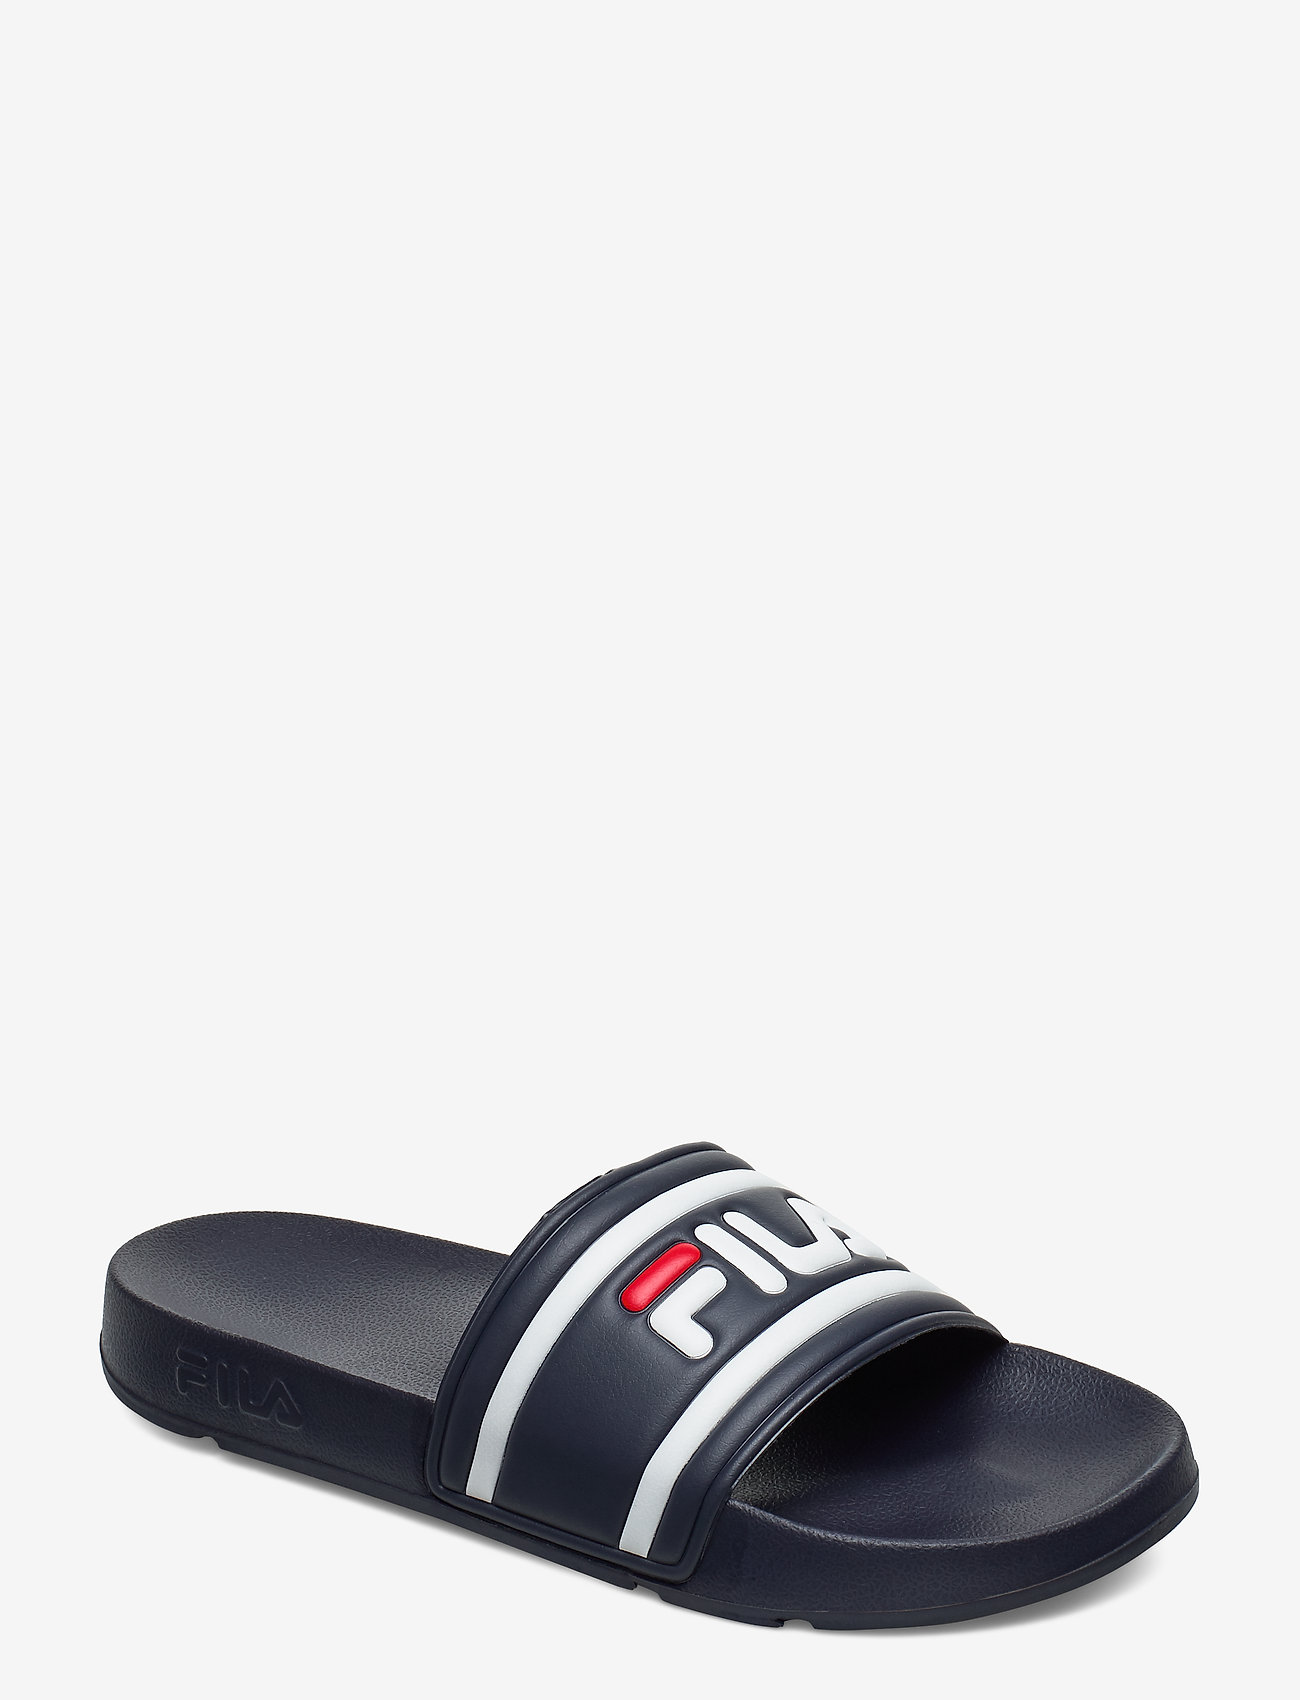 FILA - Morro Bay slipper 2.0 - pool sliders - dress blue - 0